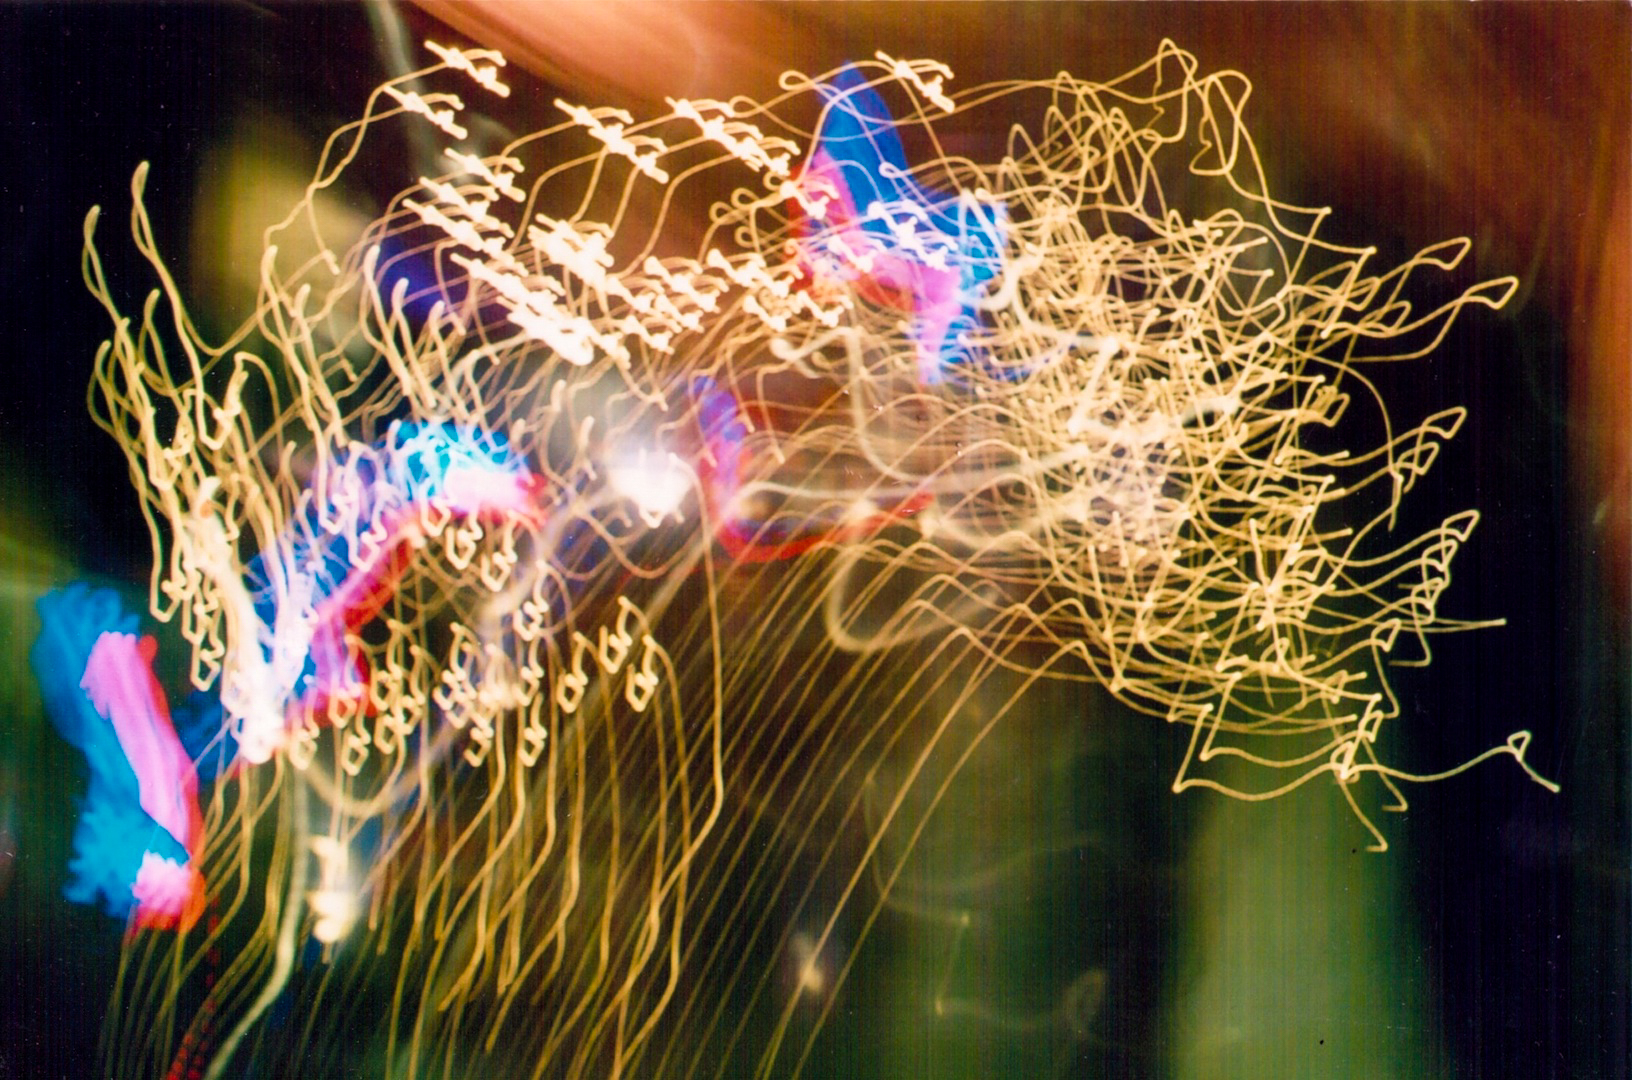 GeorginaCook_memory_scans_lights_djevera_gig.jpg